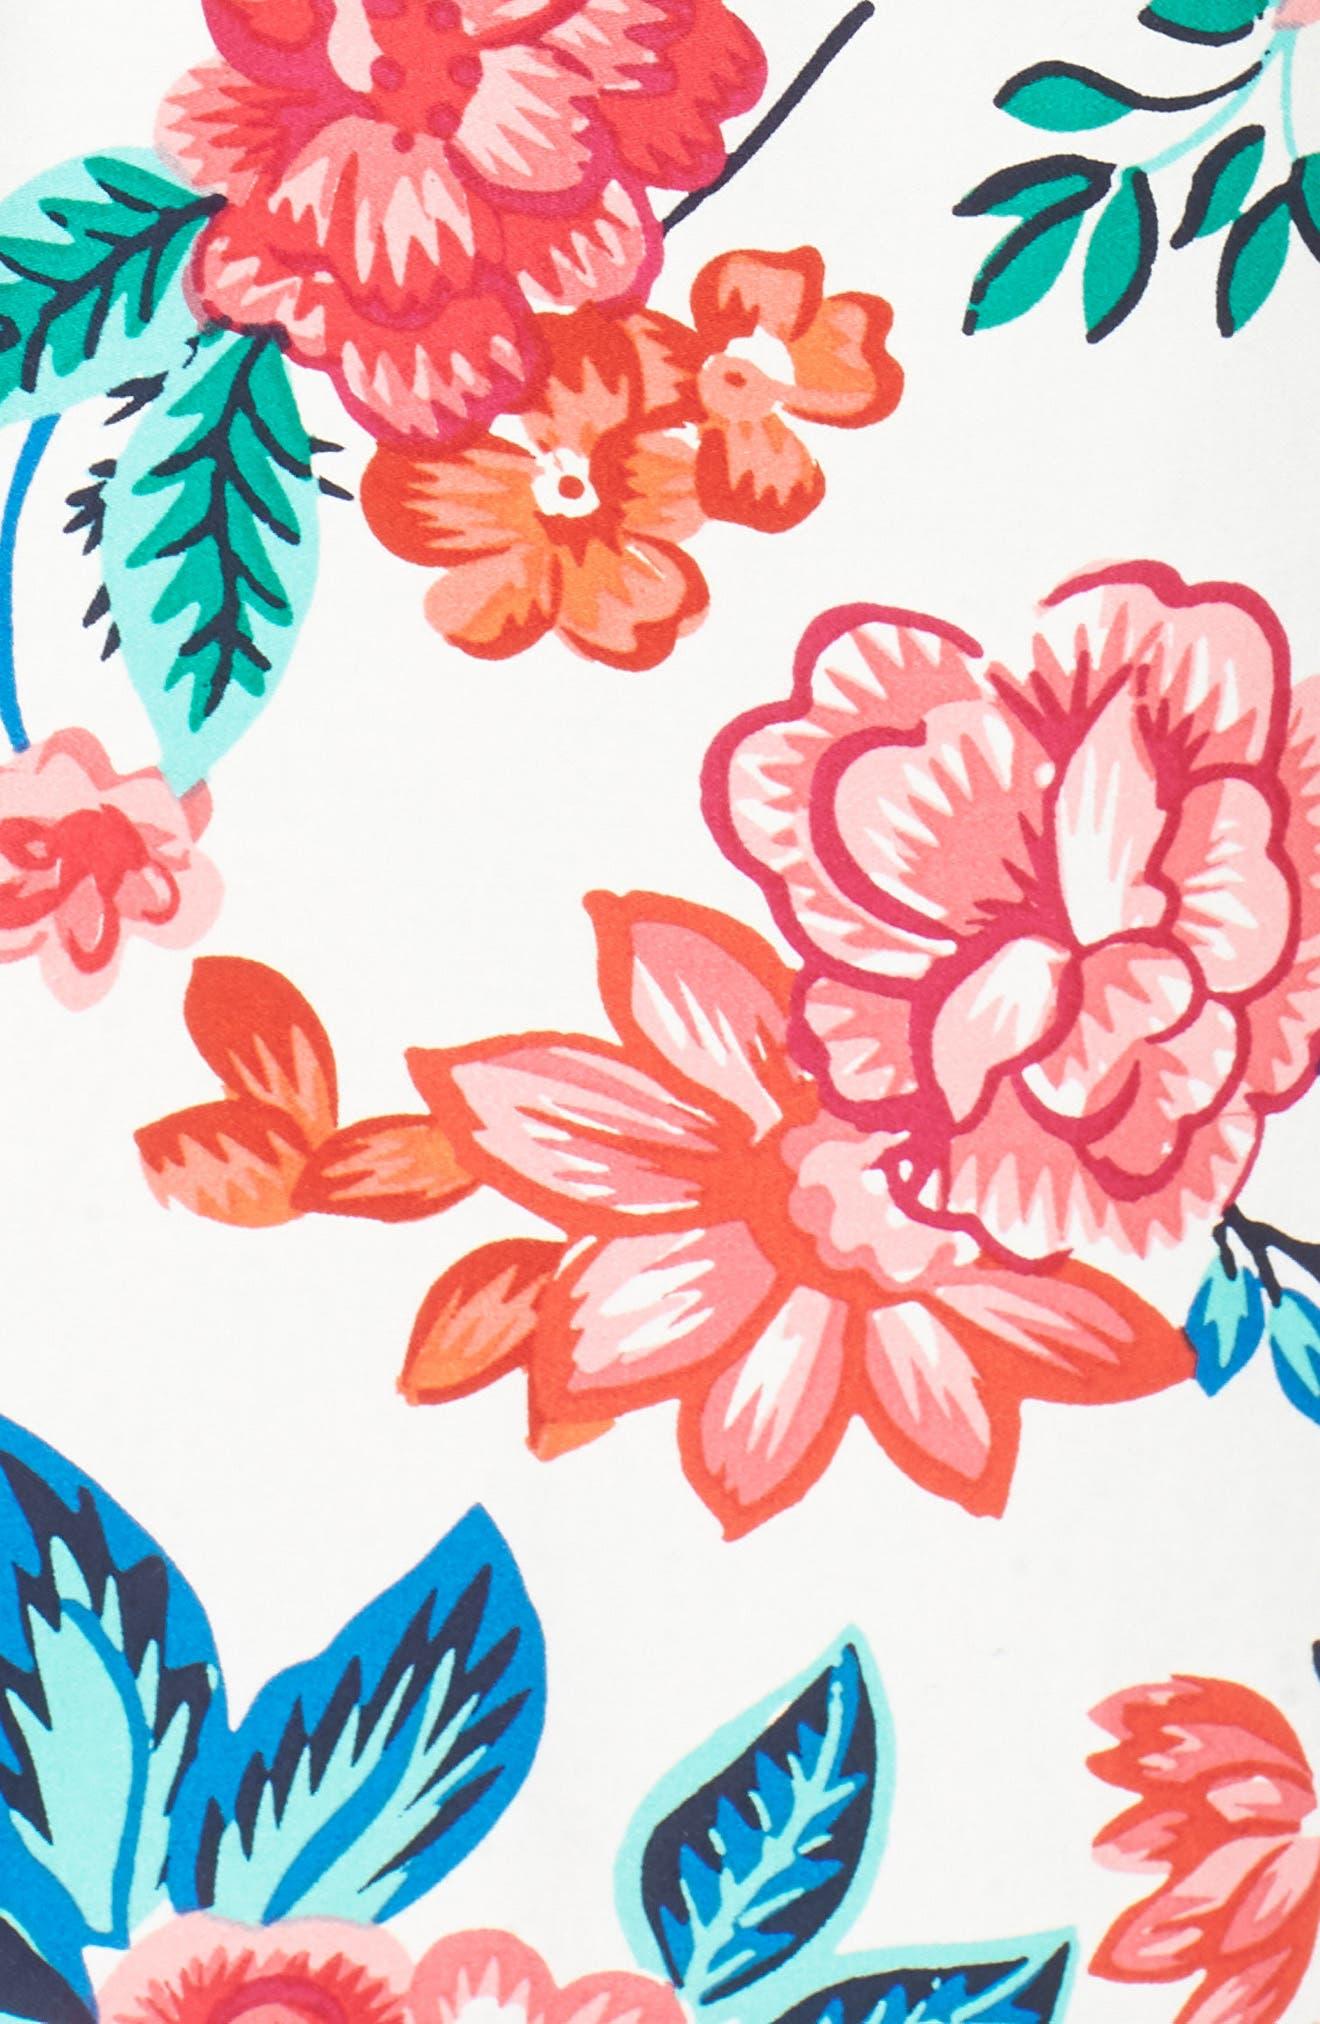 Sleeveless V-Neck Stretch Cotton Jumpsuit,                             Alternate thumbnail 6, color,                             900